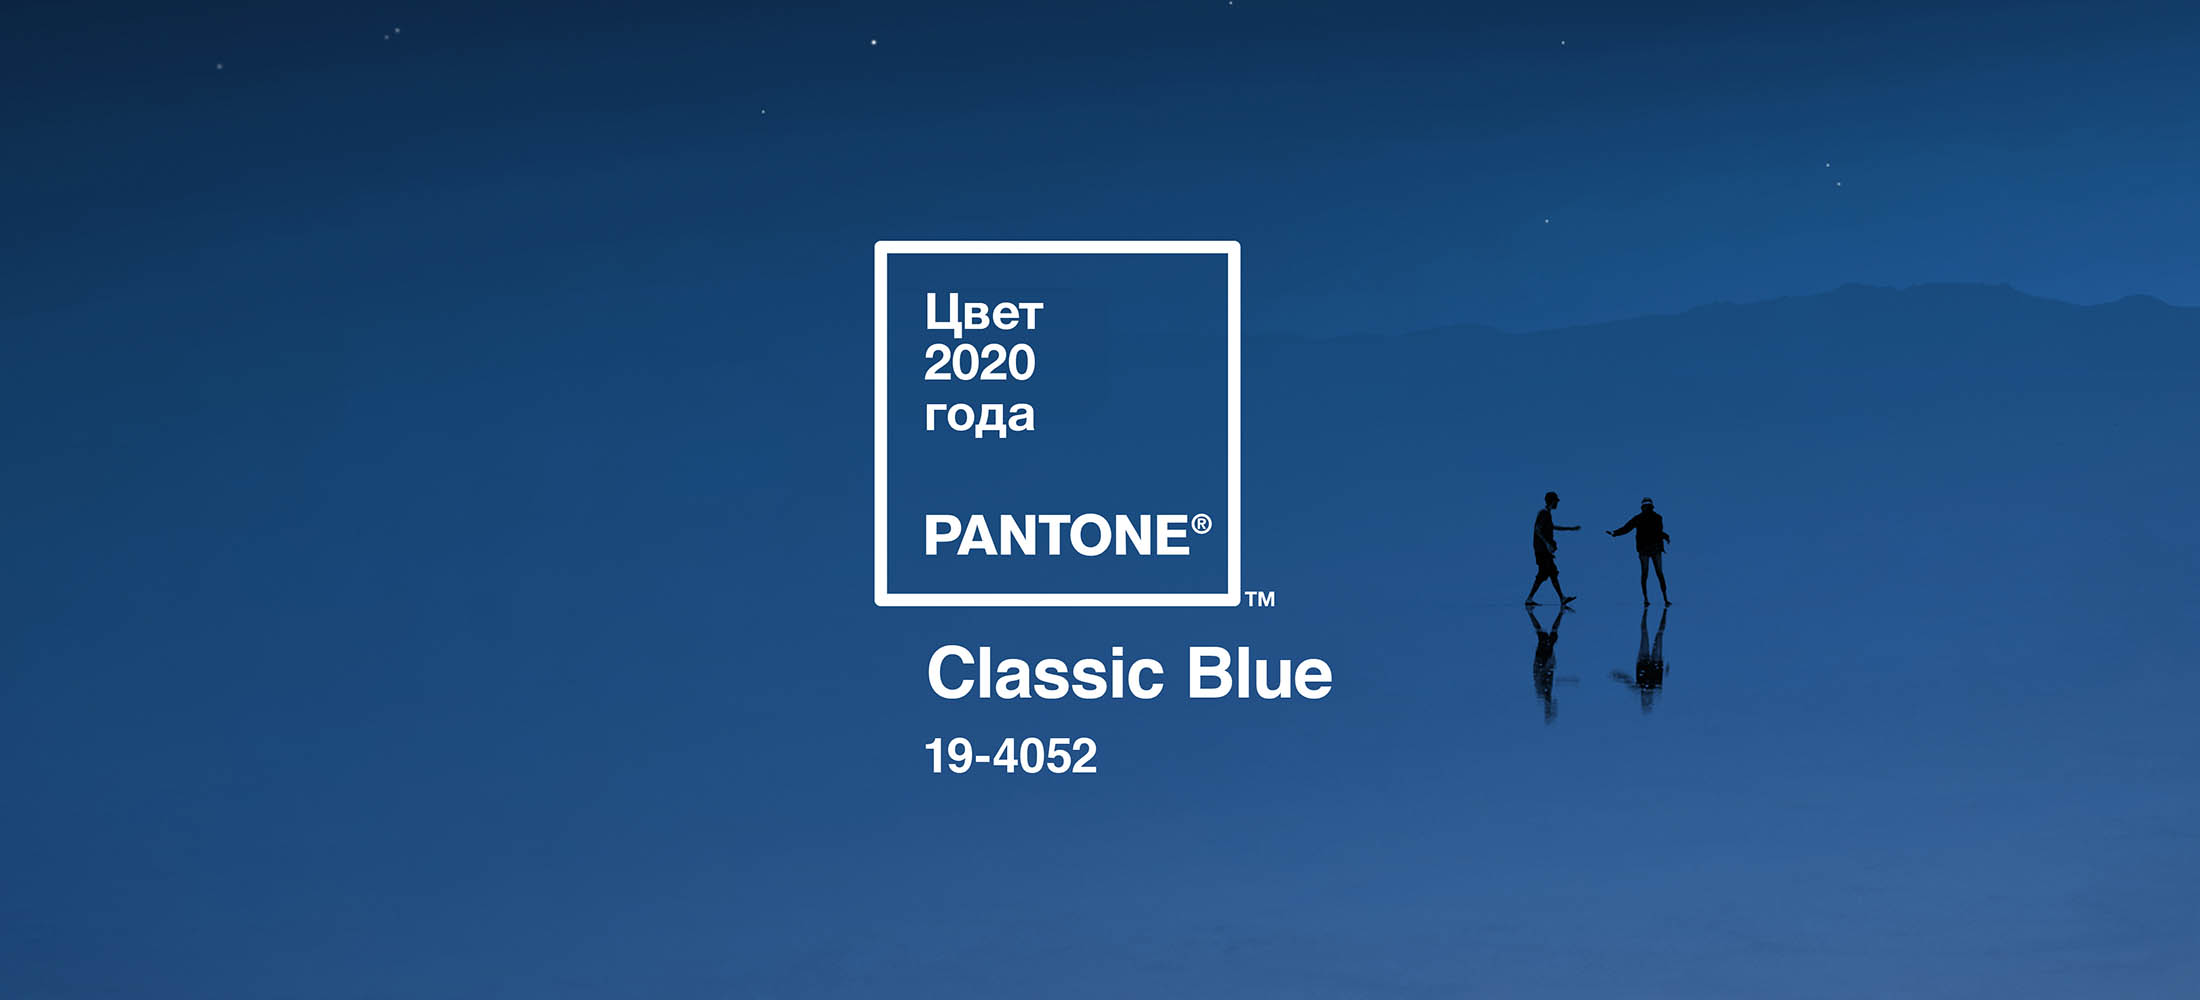 Pantone объявляет цвет 2020 года, PANTONE® 19-4052 Classic Blue (Классический синий)